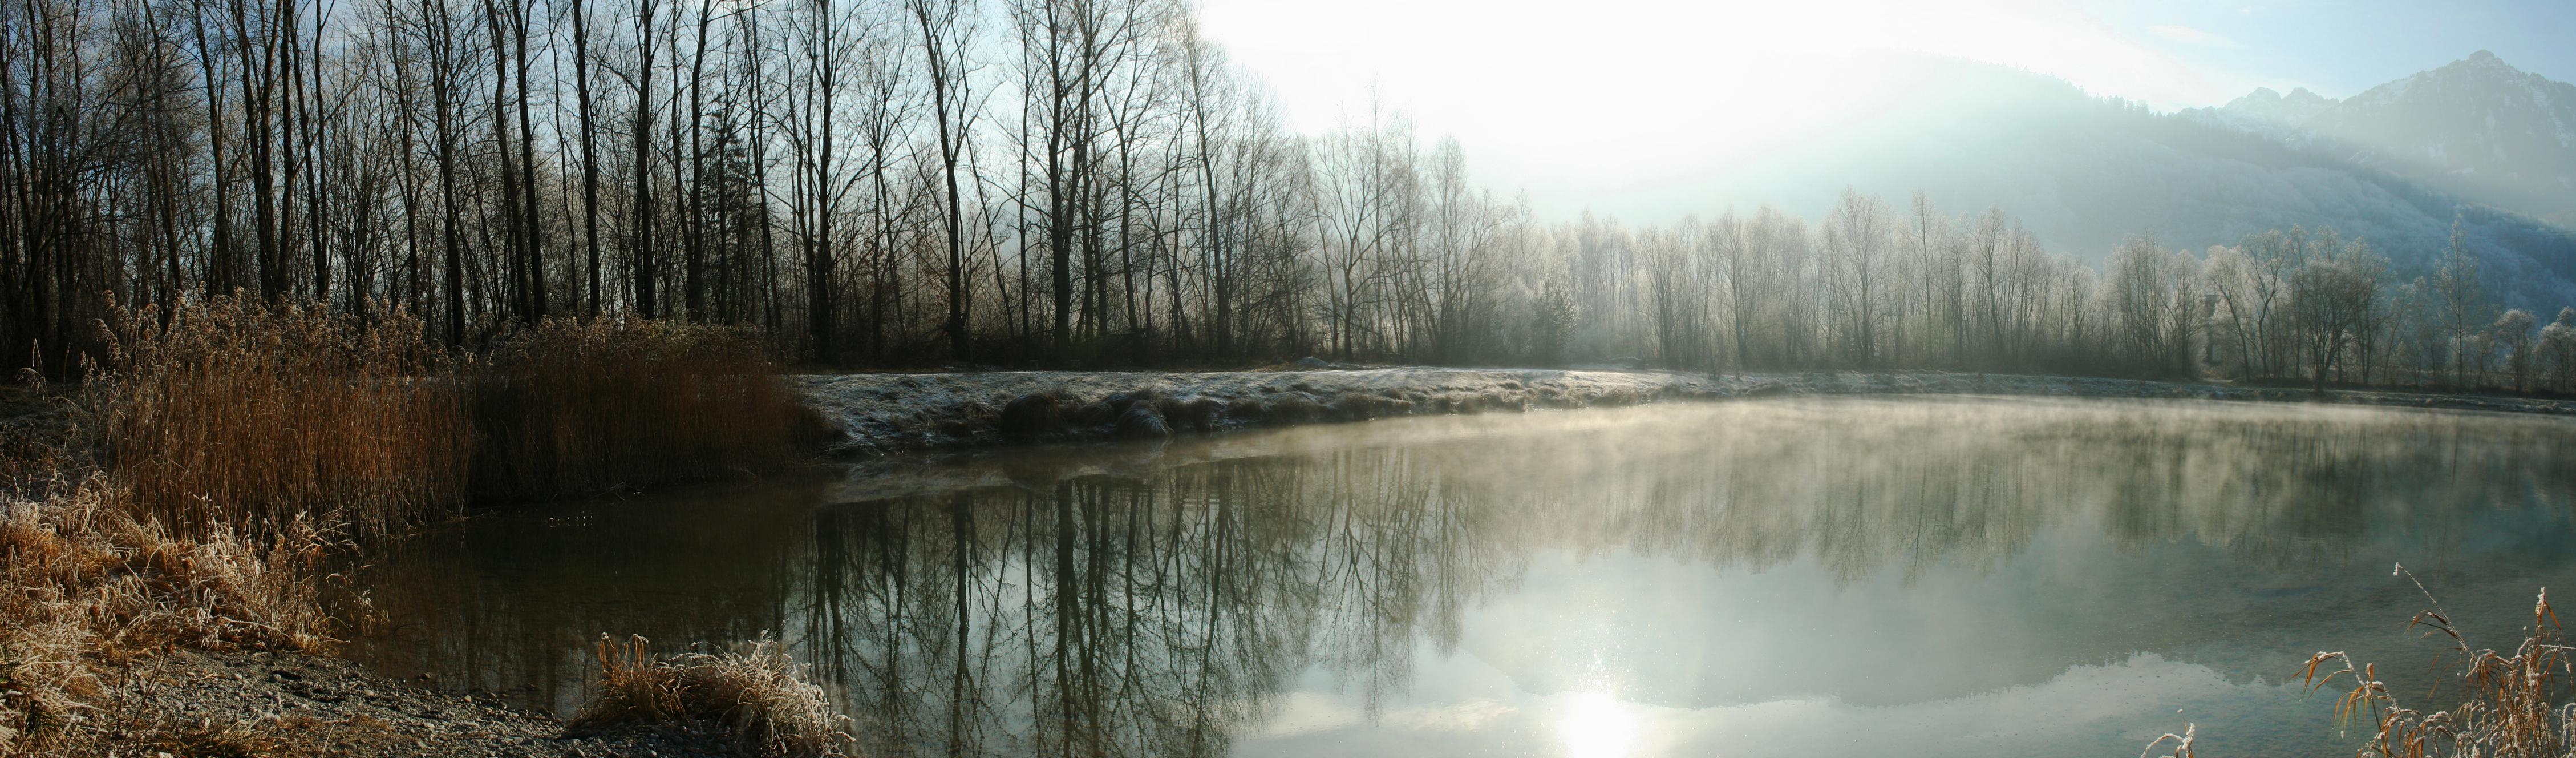 Mist.river svg #4, Download drawings